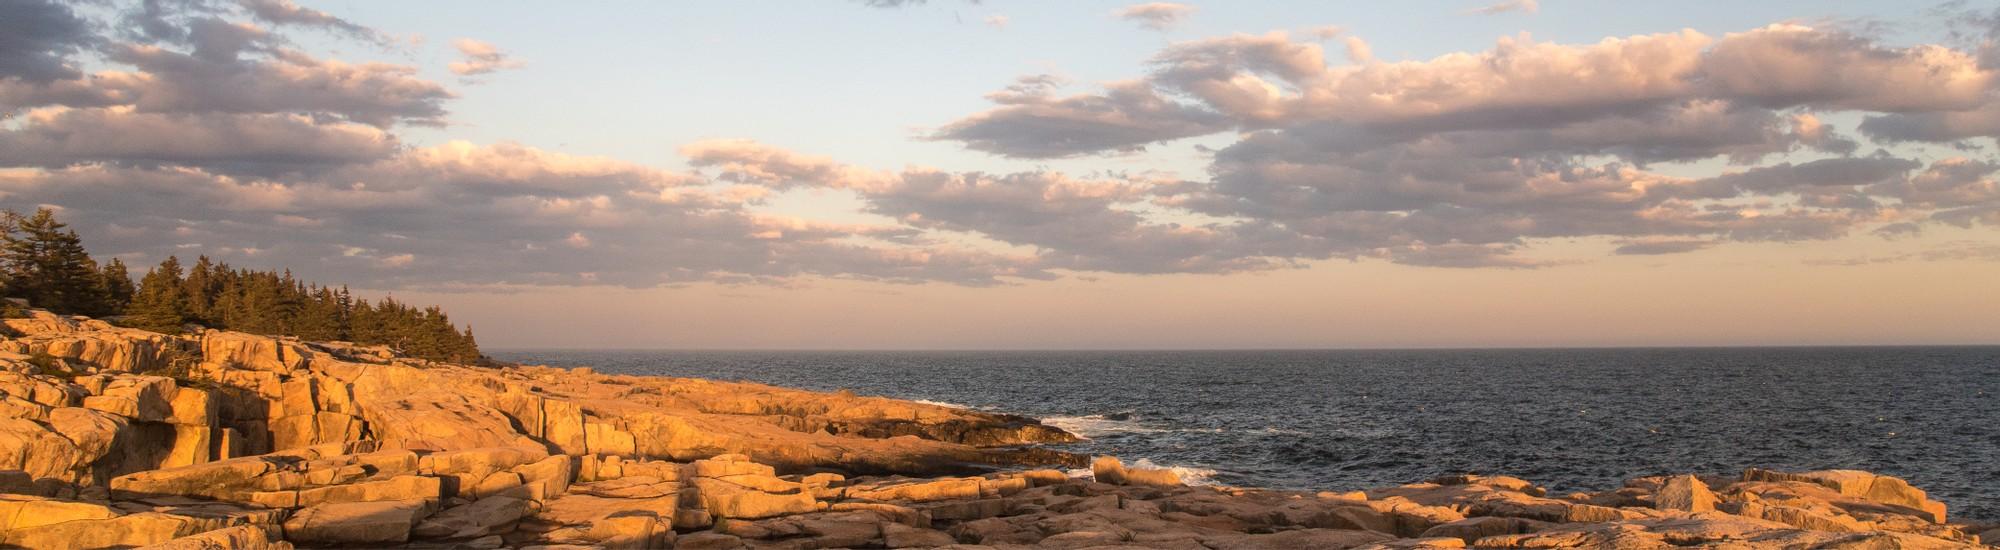 Sunrise on rocks at ocean's edge